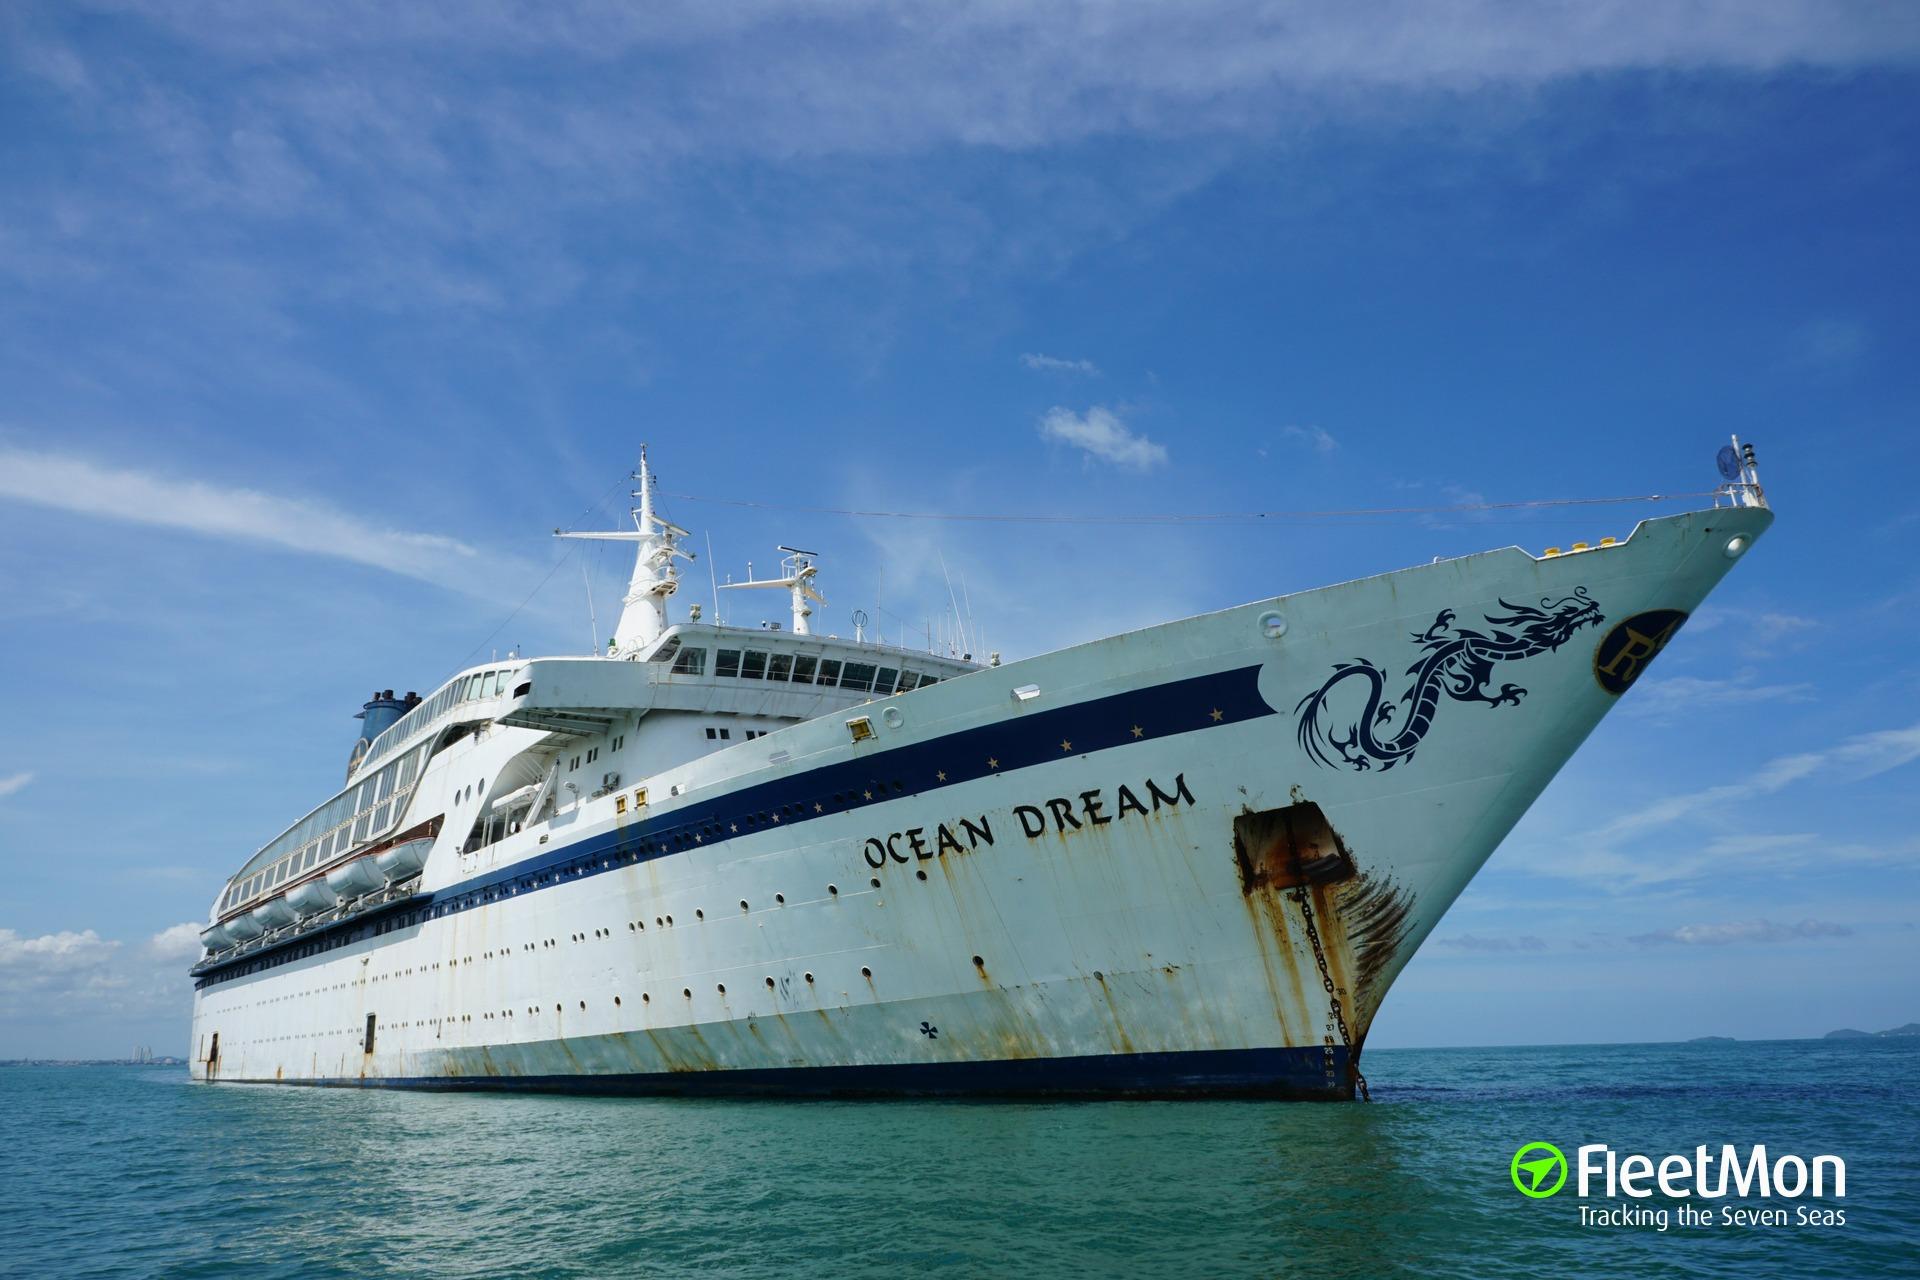 photo of ocean dream imo 7211517 mmsi 671326000 callsign 5vbw6